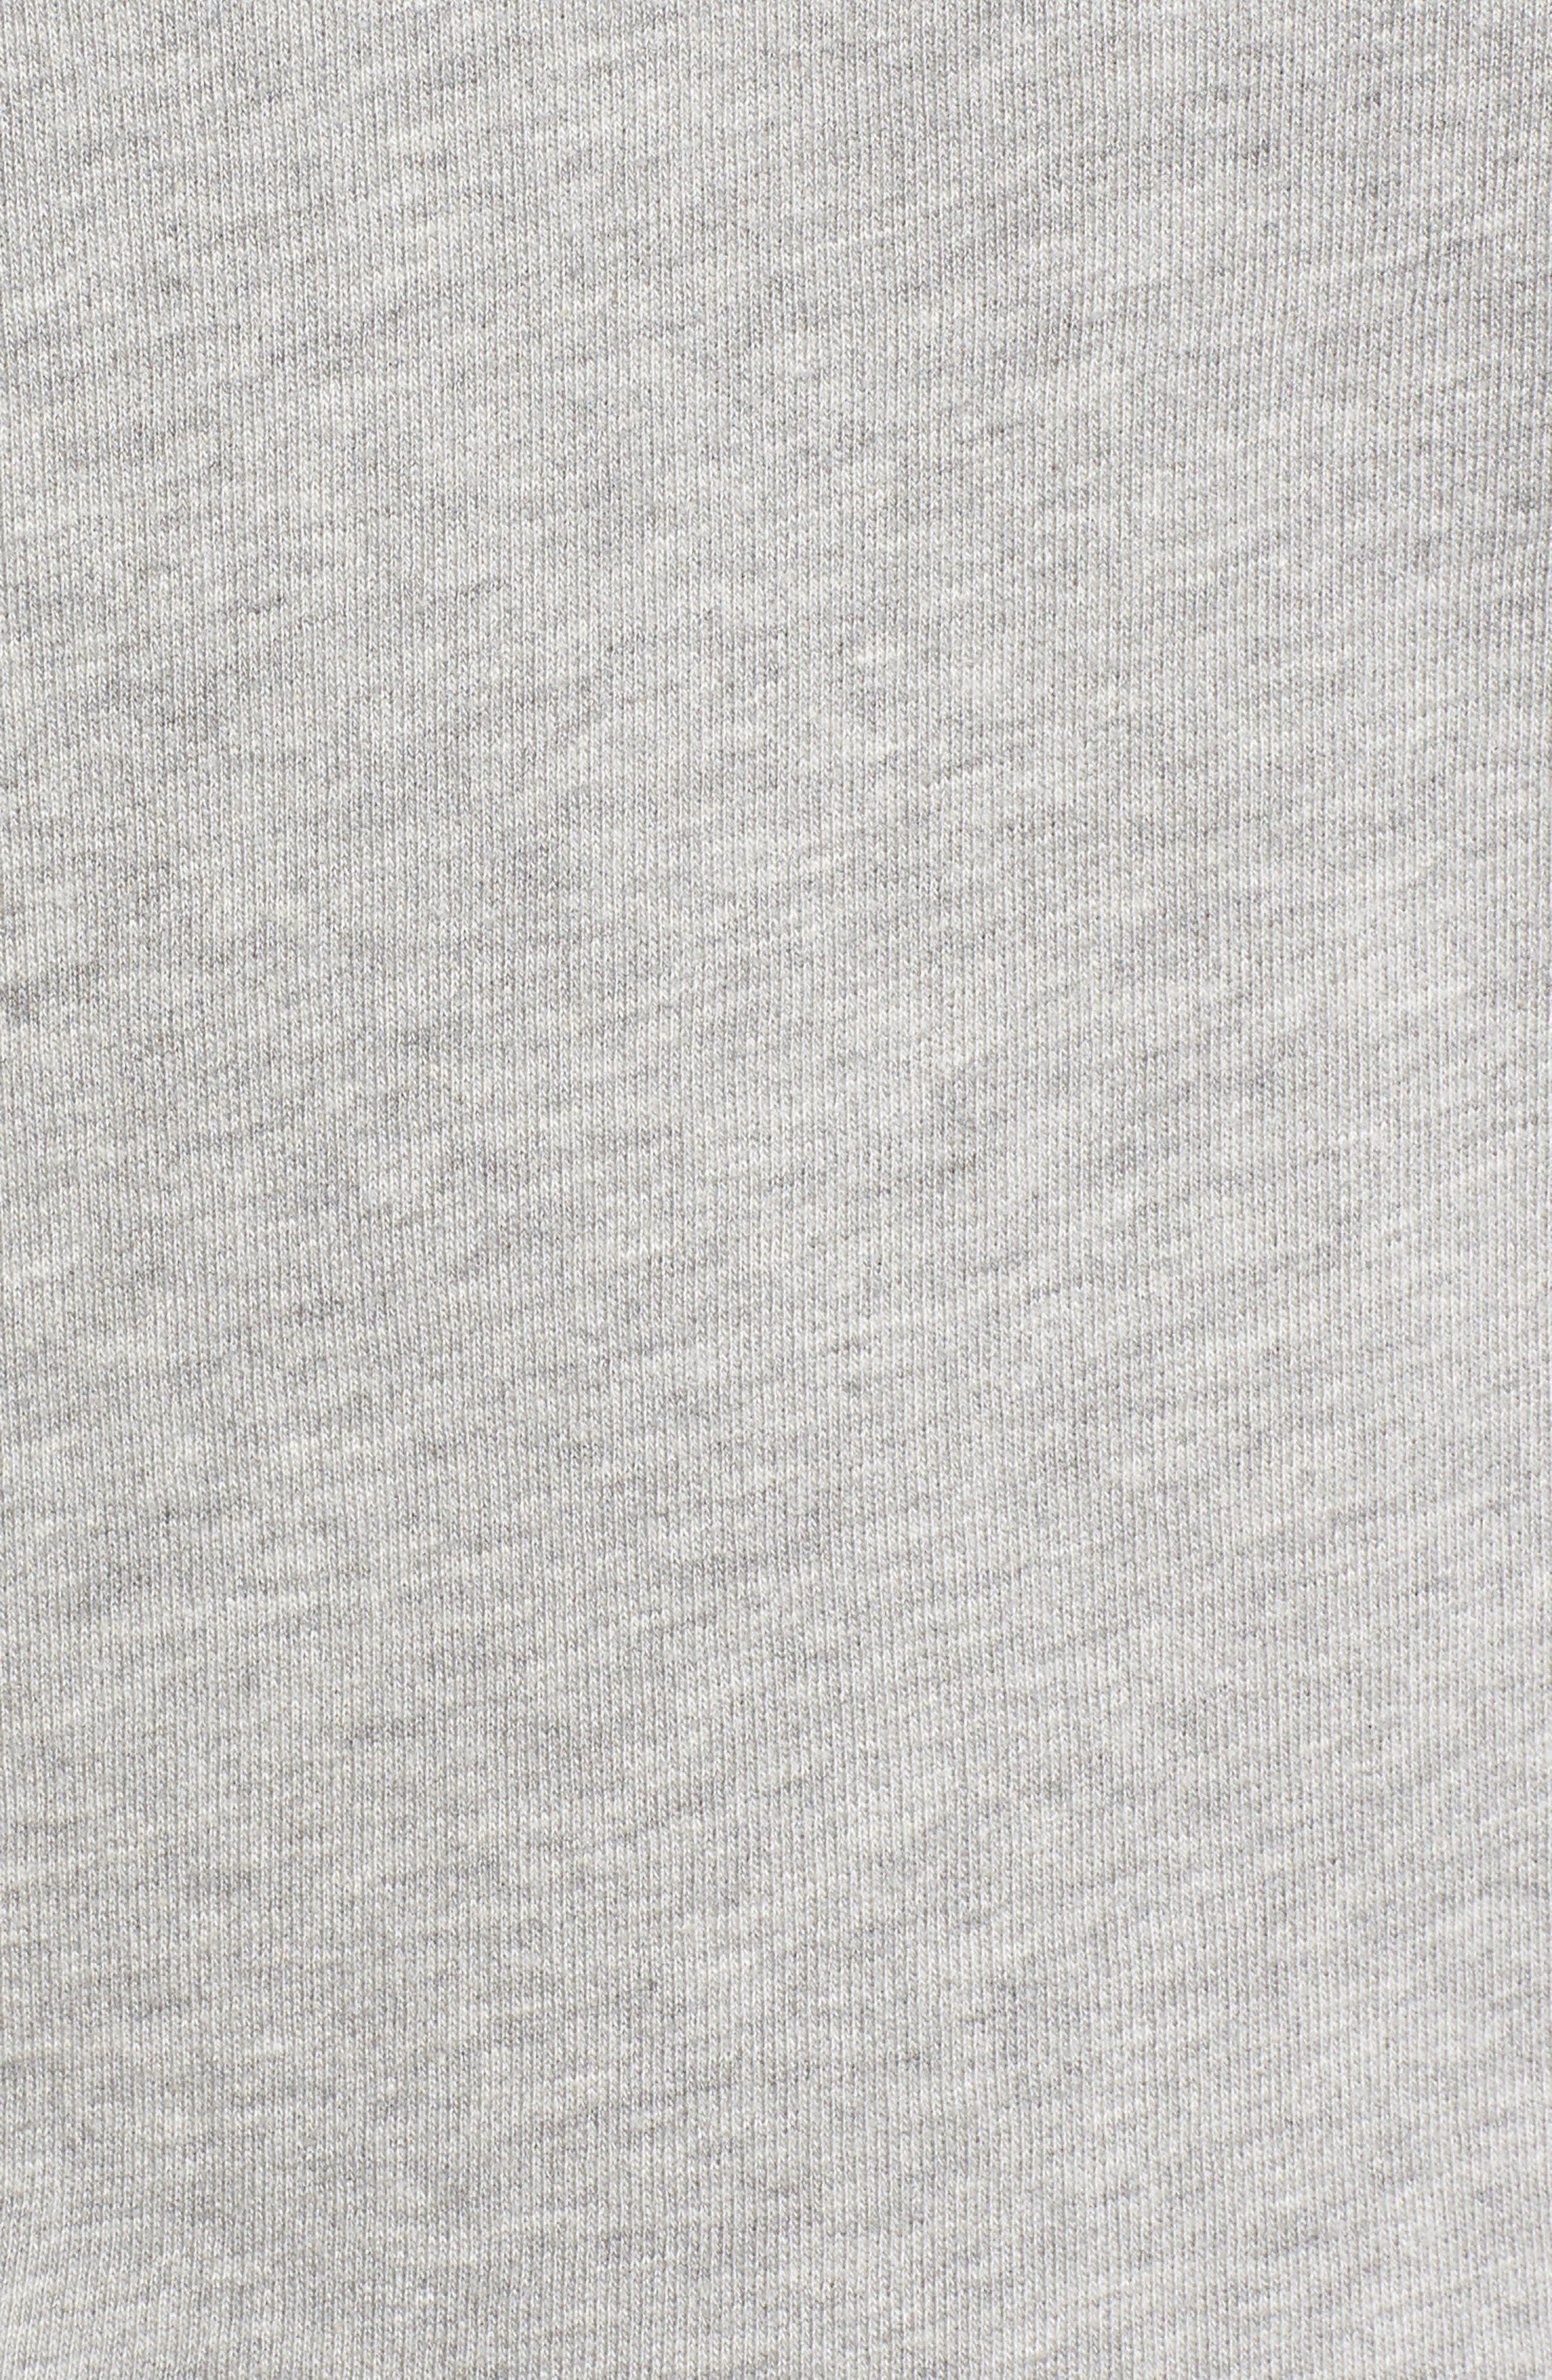 Kelli Paris Sweatshirt,                             Alternate thumbnail 5, color,                             032